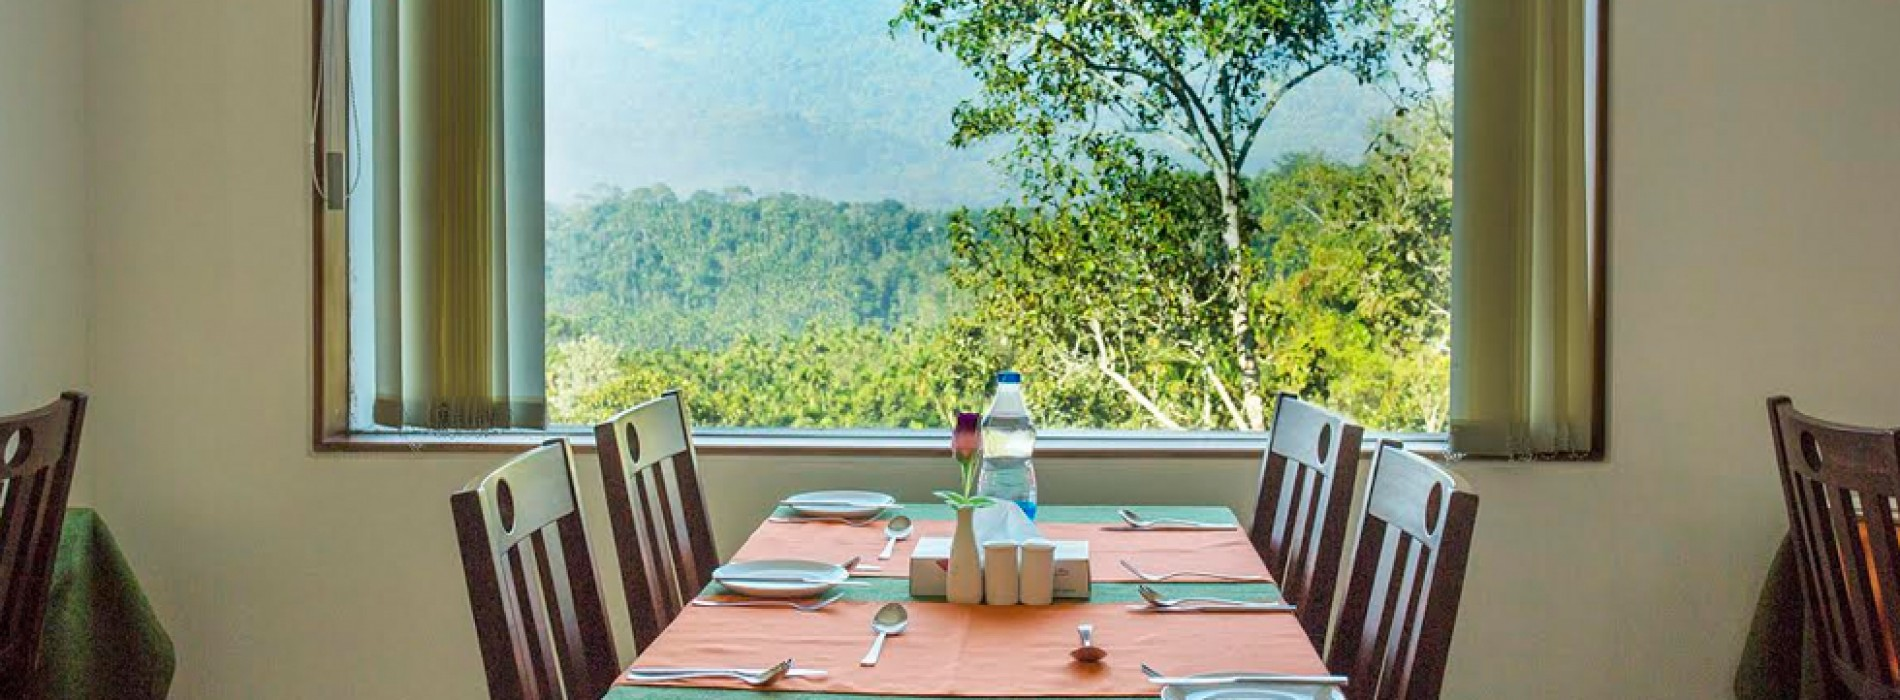 "Frontline G Holidays ""Nest 'n' Mist"" Resort joins the RCI network"